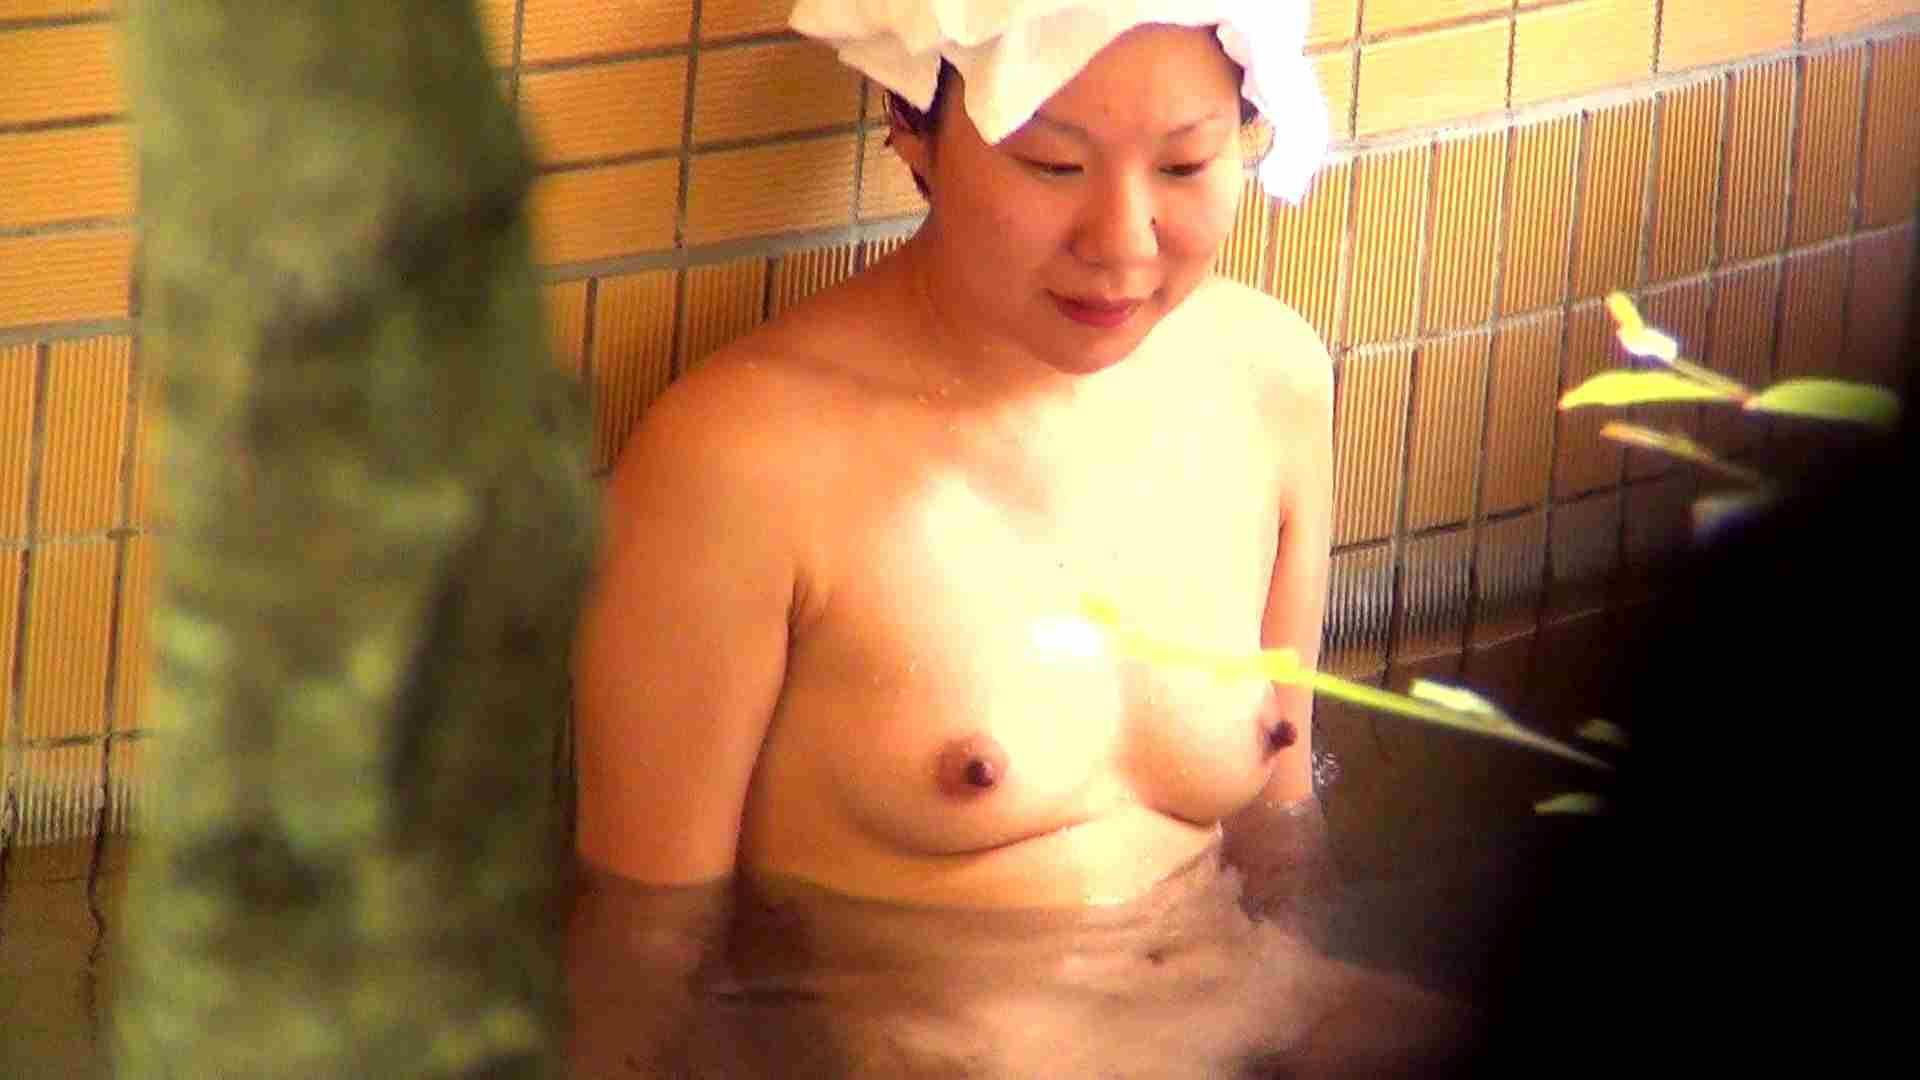 Aquaな露天風呂Vol.292 OLセックス 覗き性交動画流出 106画像 53